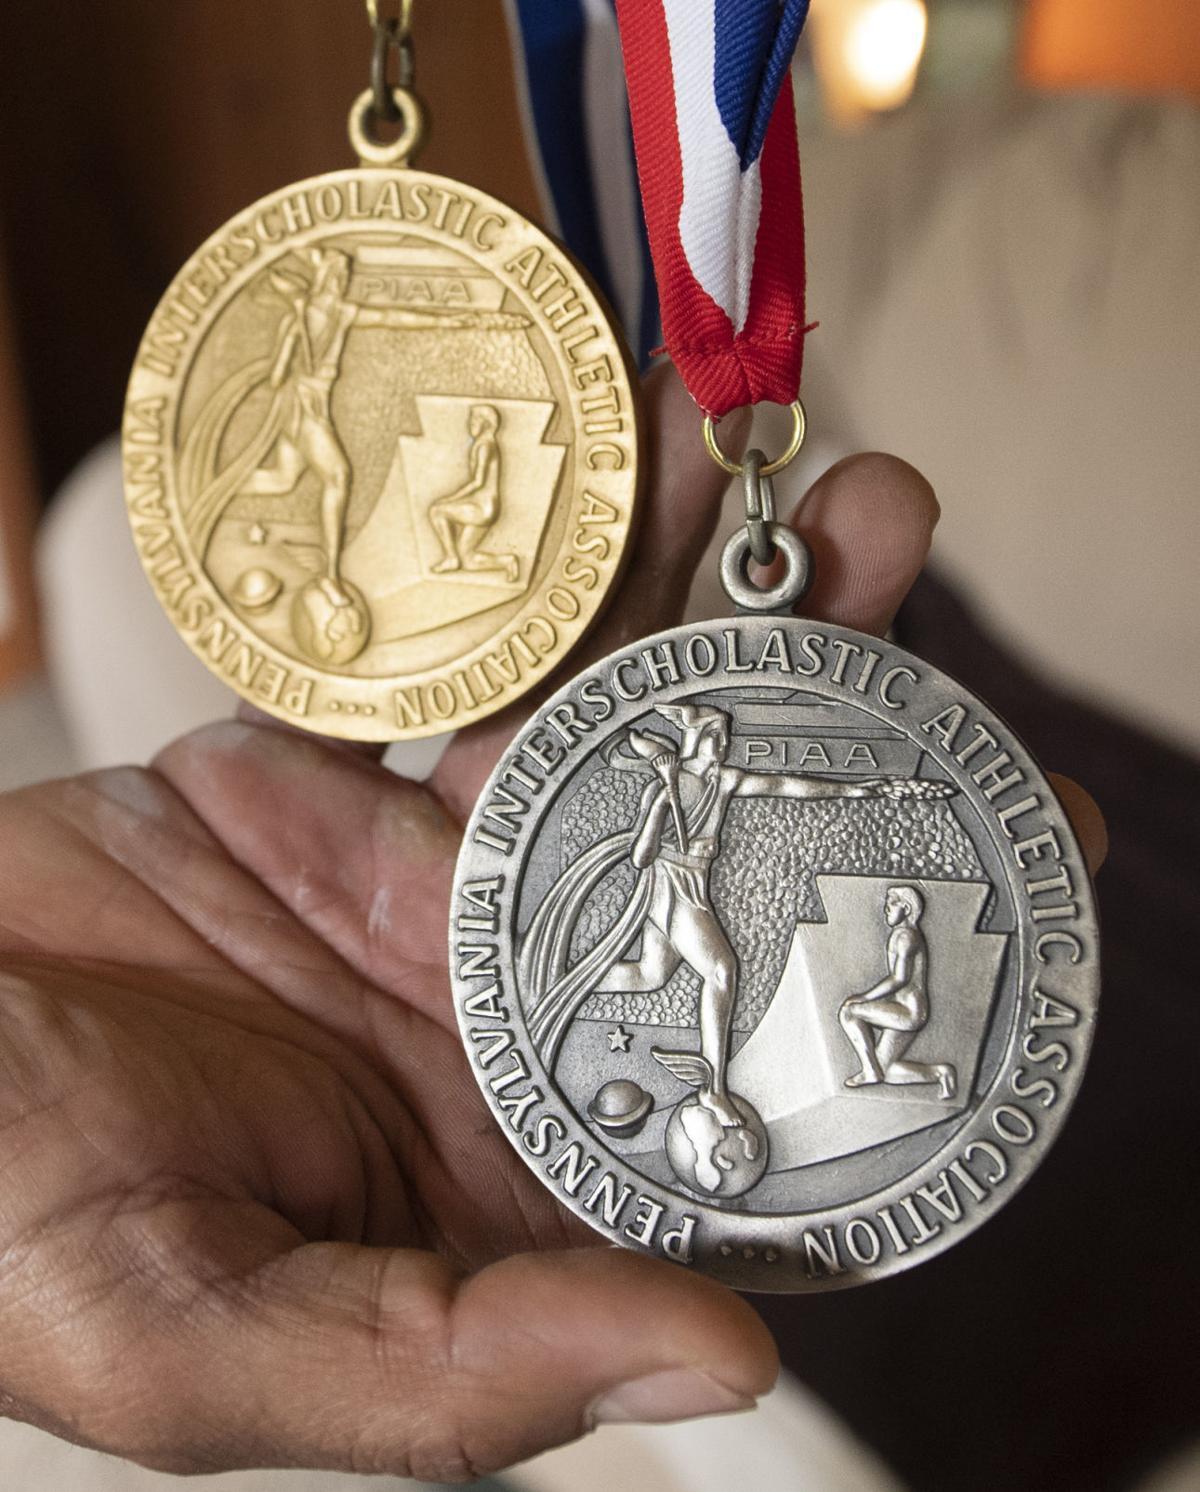 Simmie Strausbaugh's medals